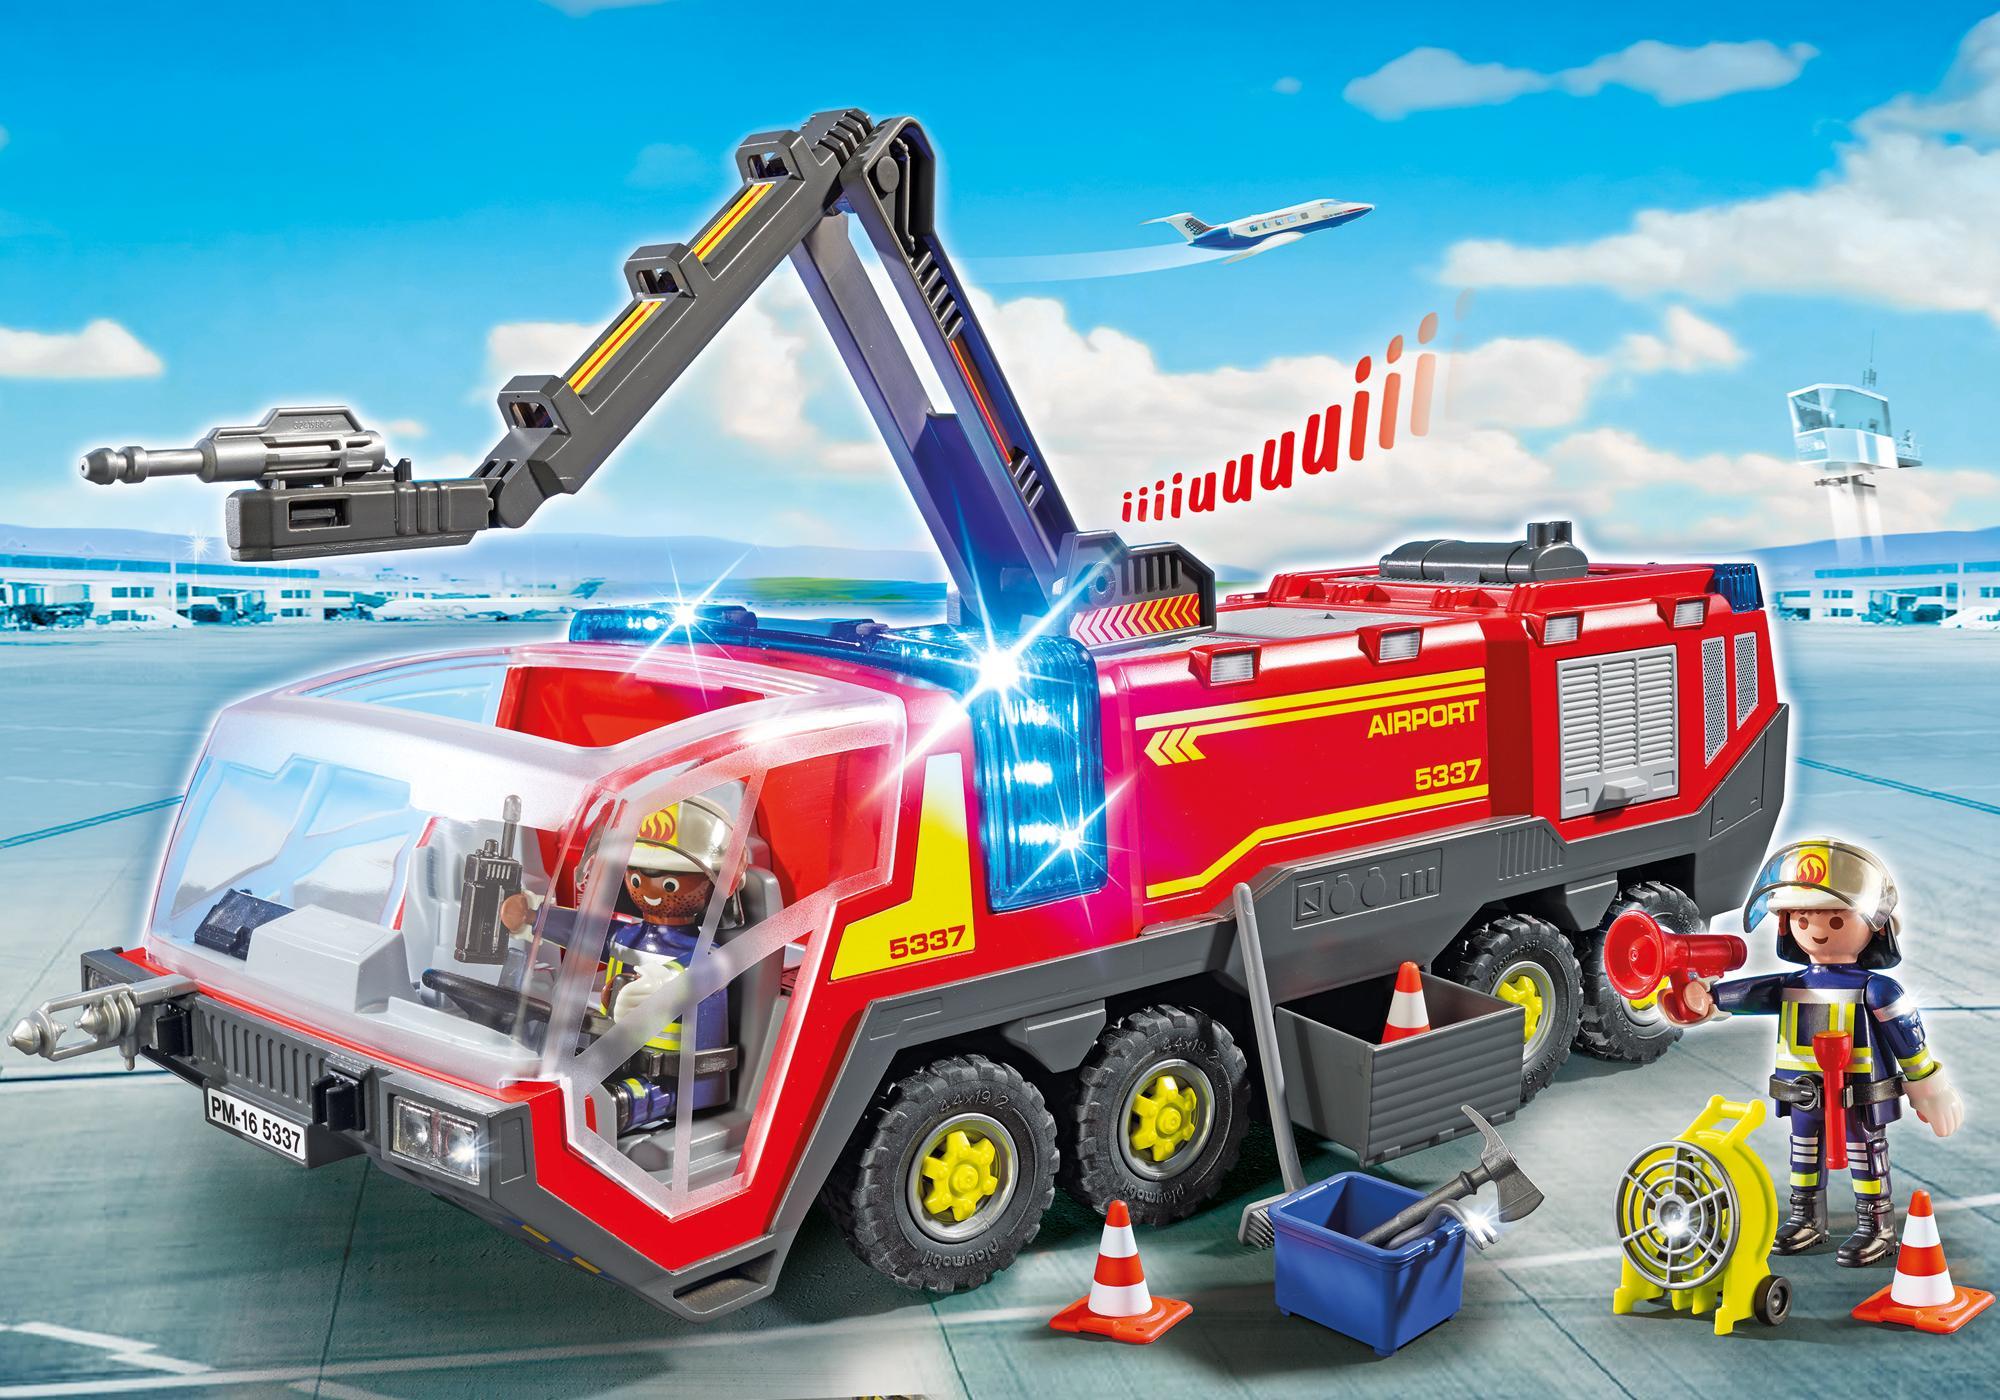 5337_product_detail/Πυροσβεστικό όχημα αεροδρομίου με φώτα και ήχο